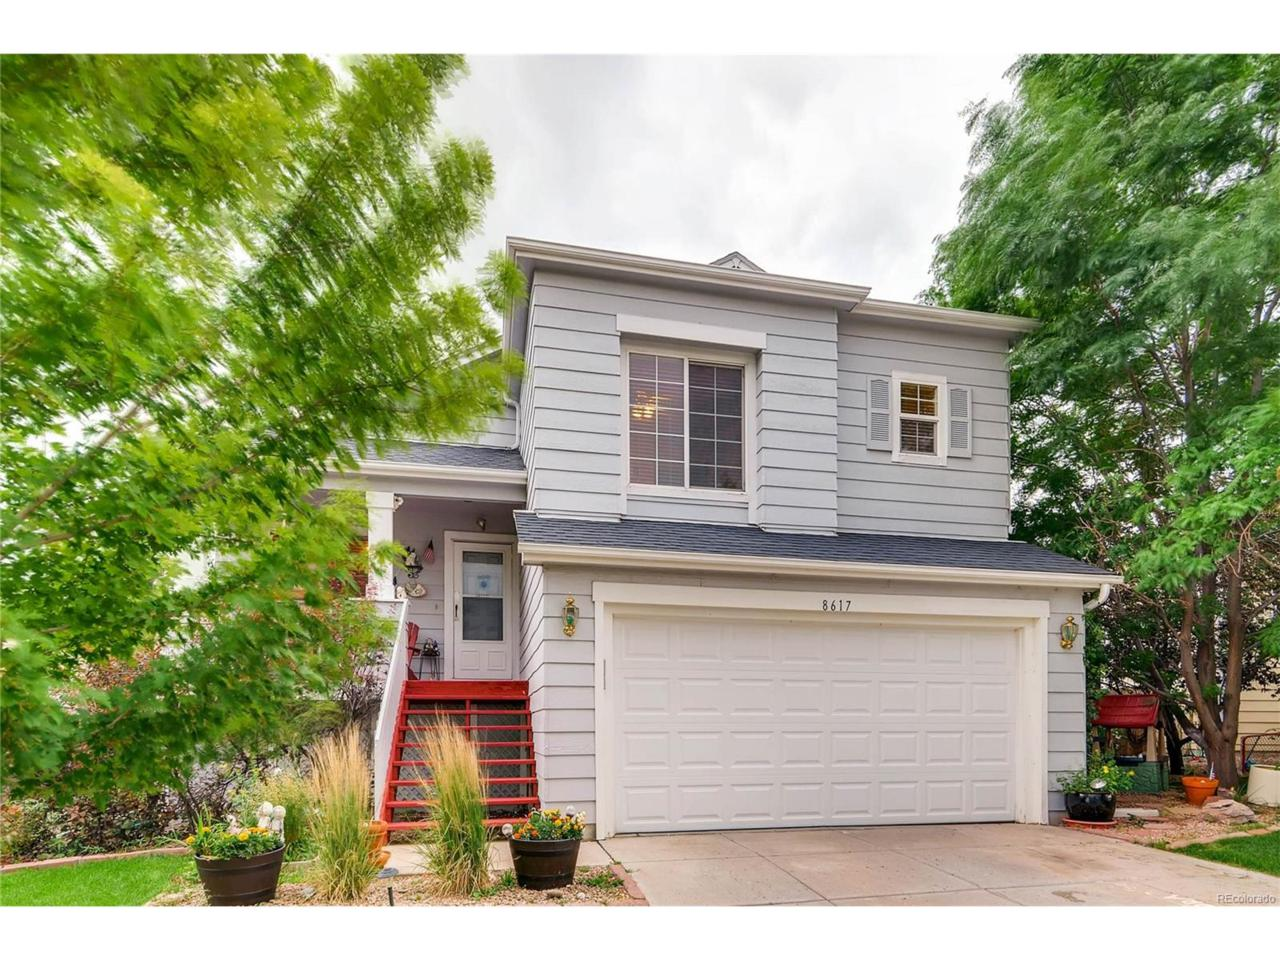 8617 Bluegrass Circle, Parker, CO 80134 (MLS #2778207) :: 8z Real Estate